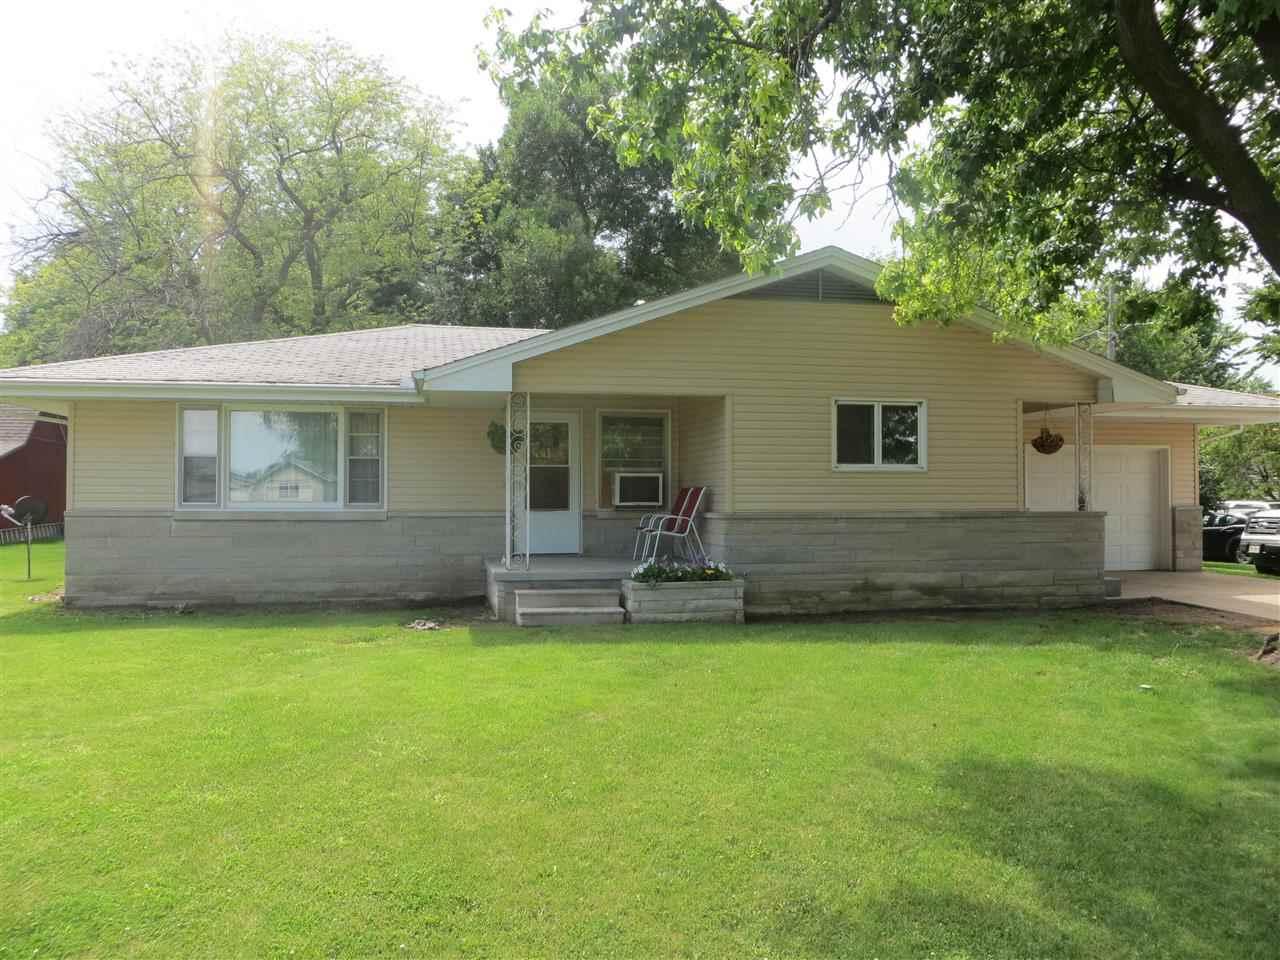 Real Estate for Sale, ListingId: 30760237, Waynesville,IL61778